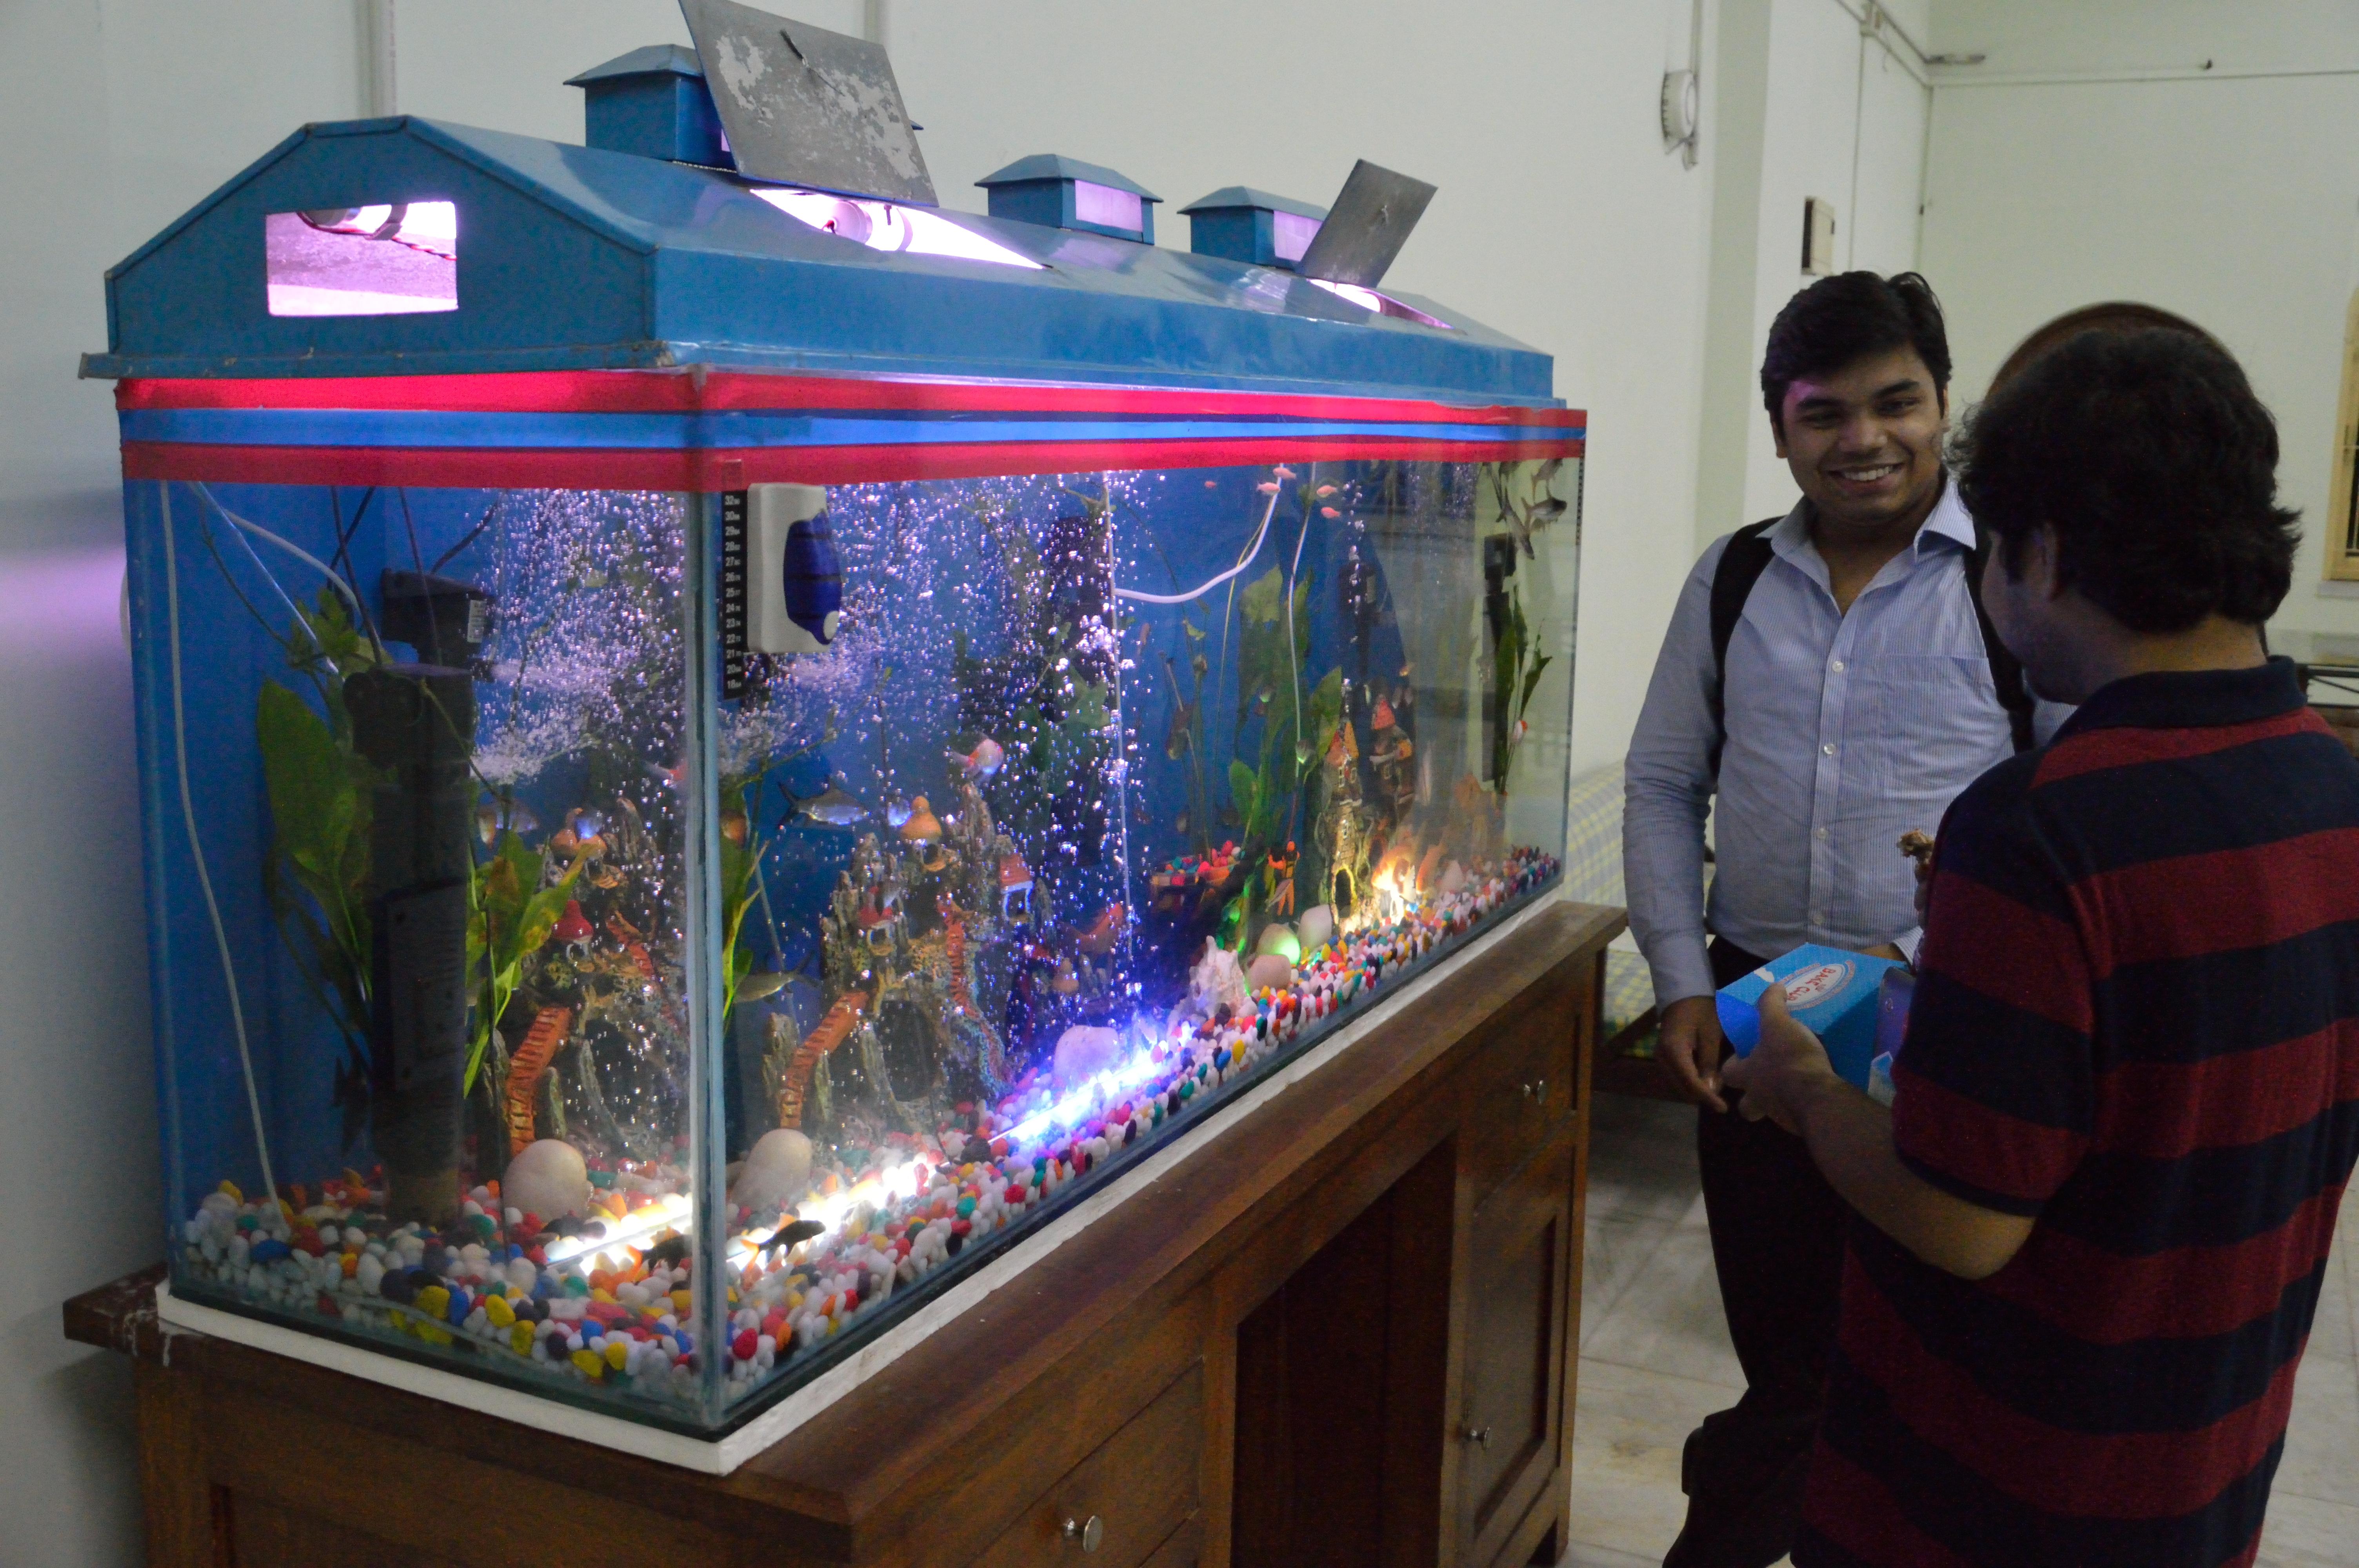 Fish for aquarium in kolkata - File Aquarium Restaurant University Guest House Jadavpur University Kolkata 2014